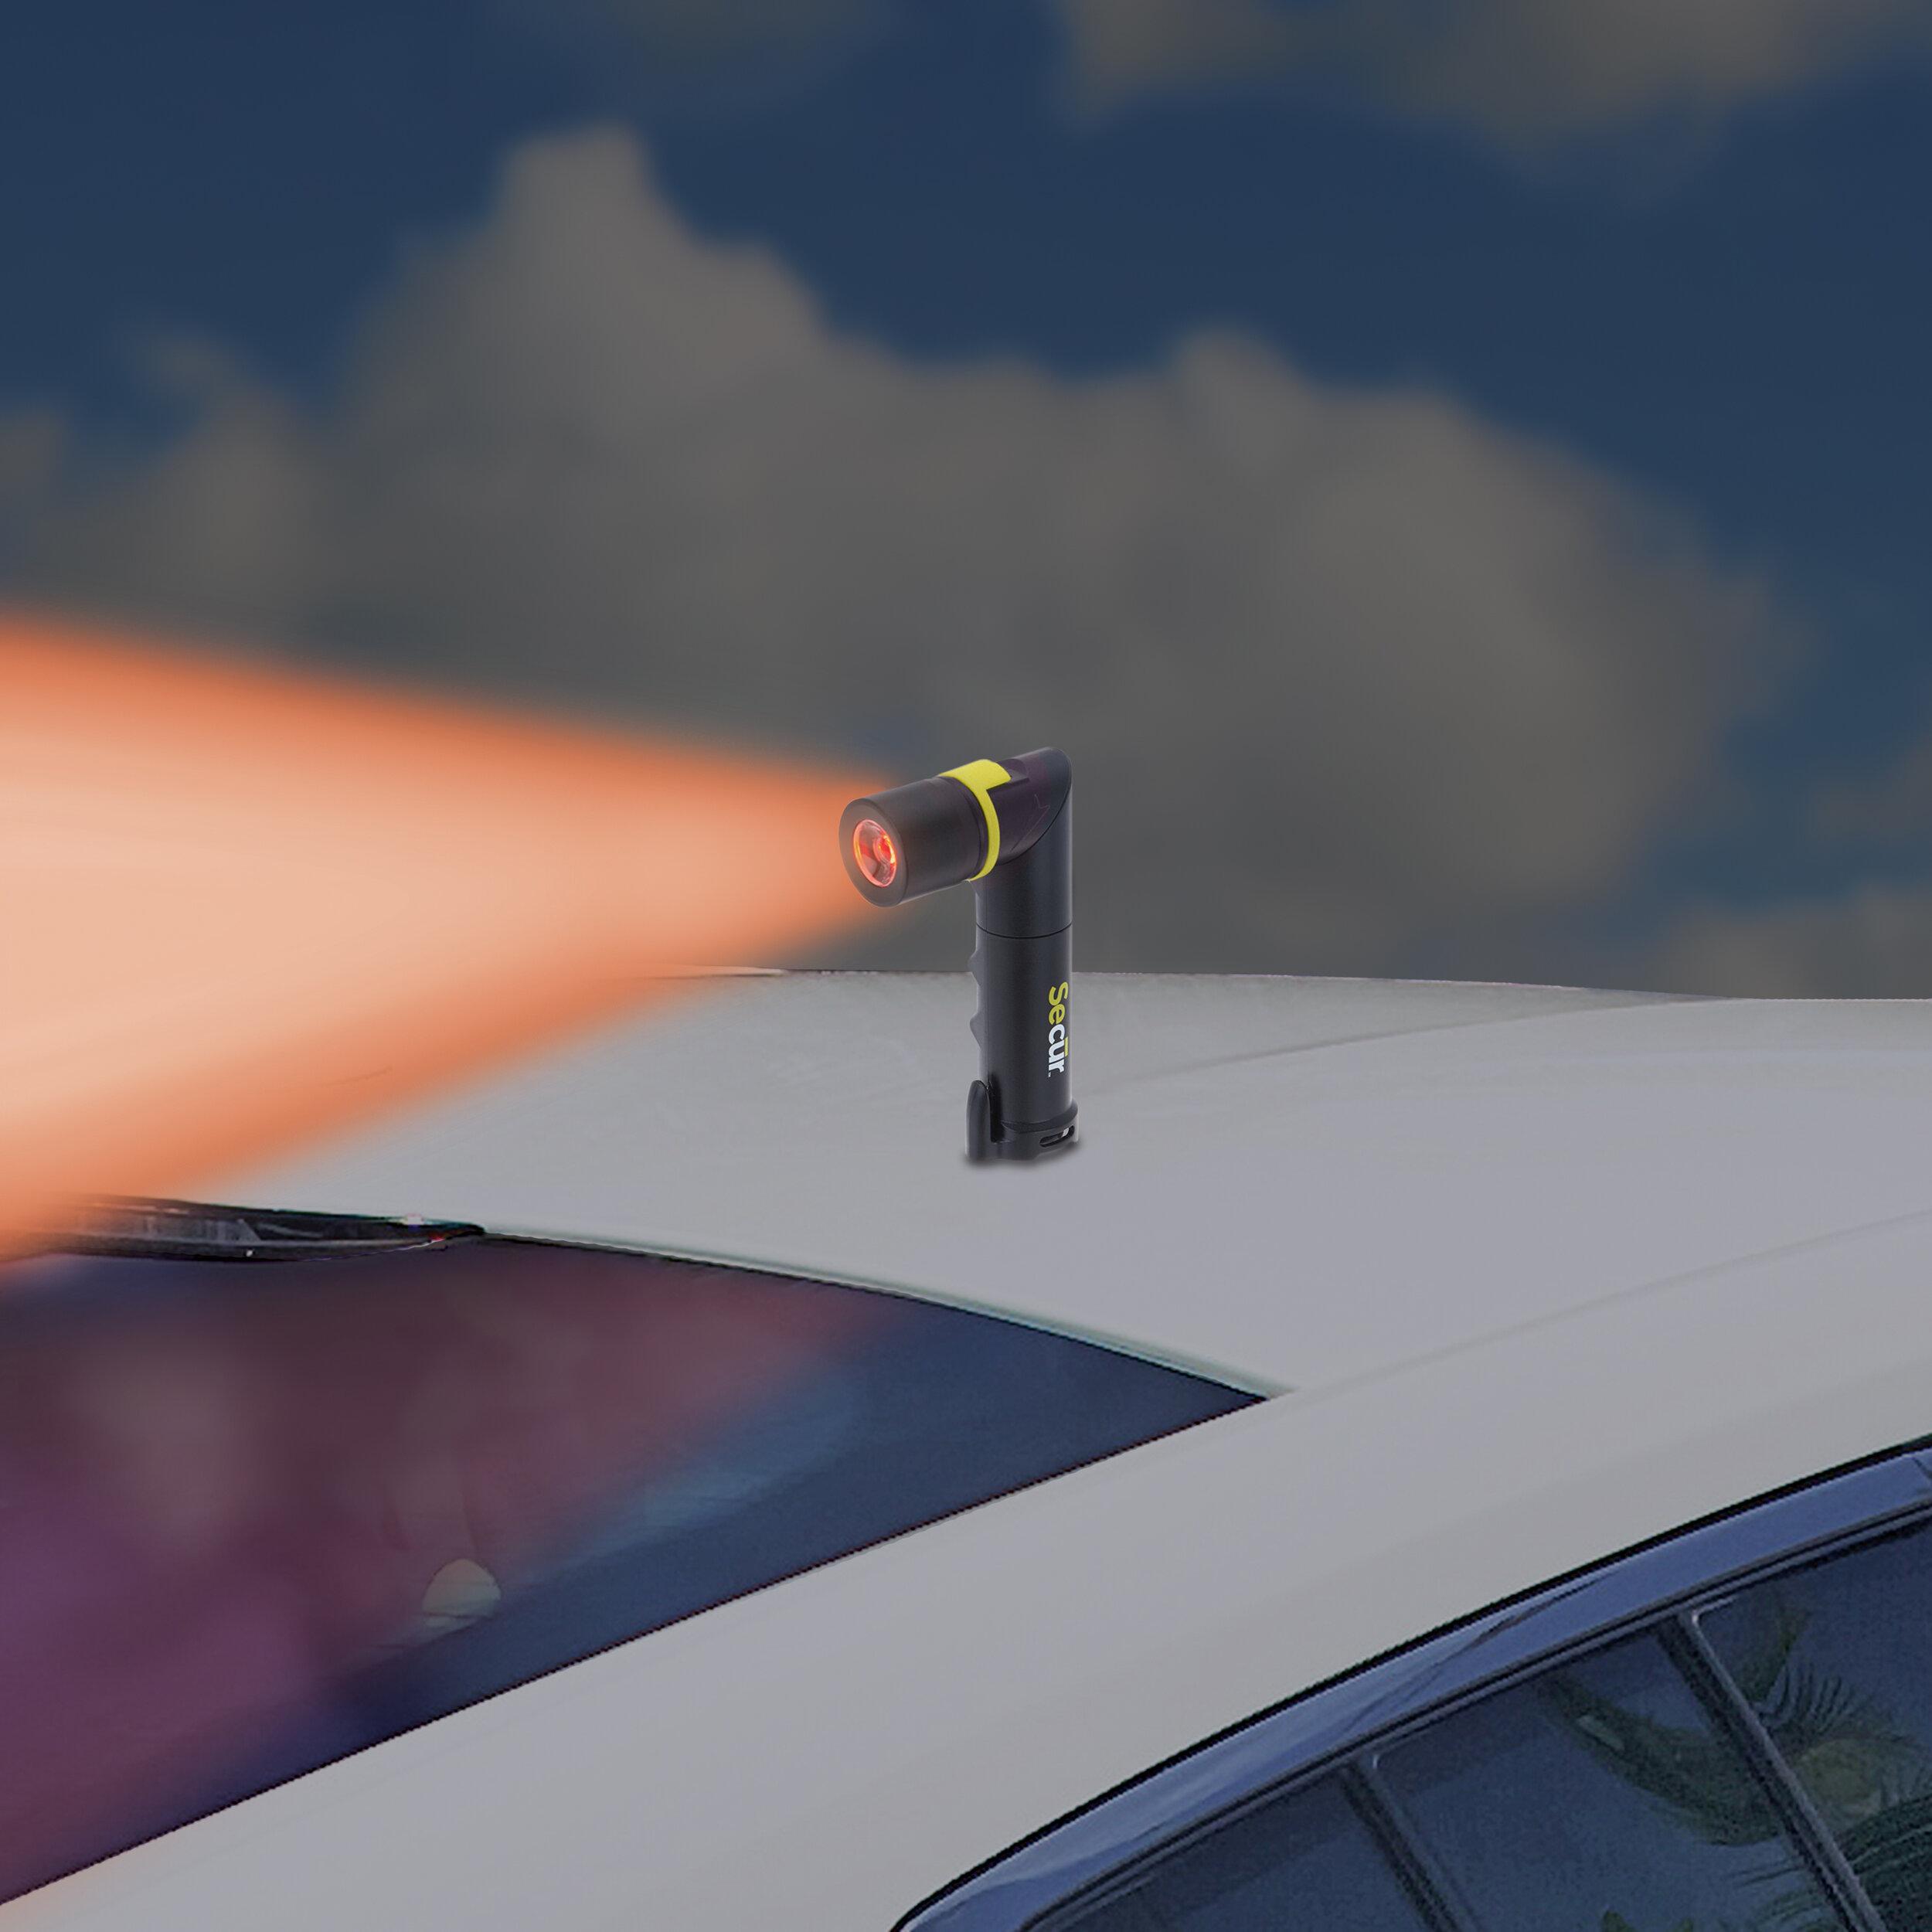 Flashing Red Emergency Light